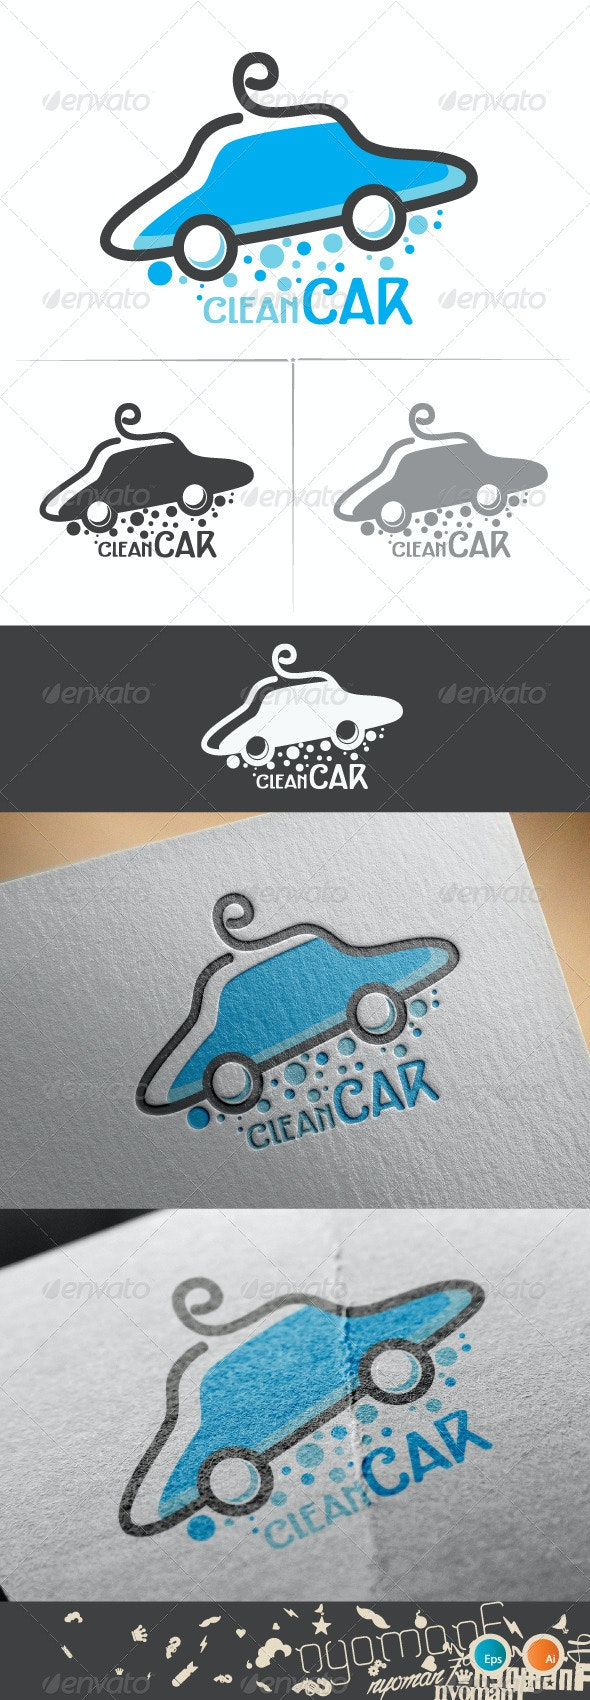 Clean Car Logo Template - Logo Templates